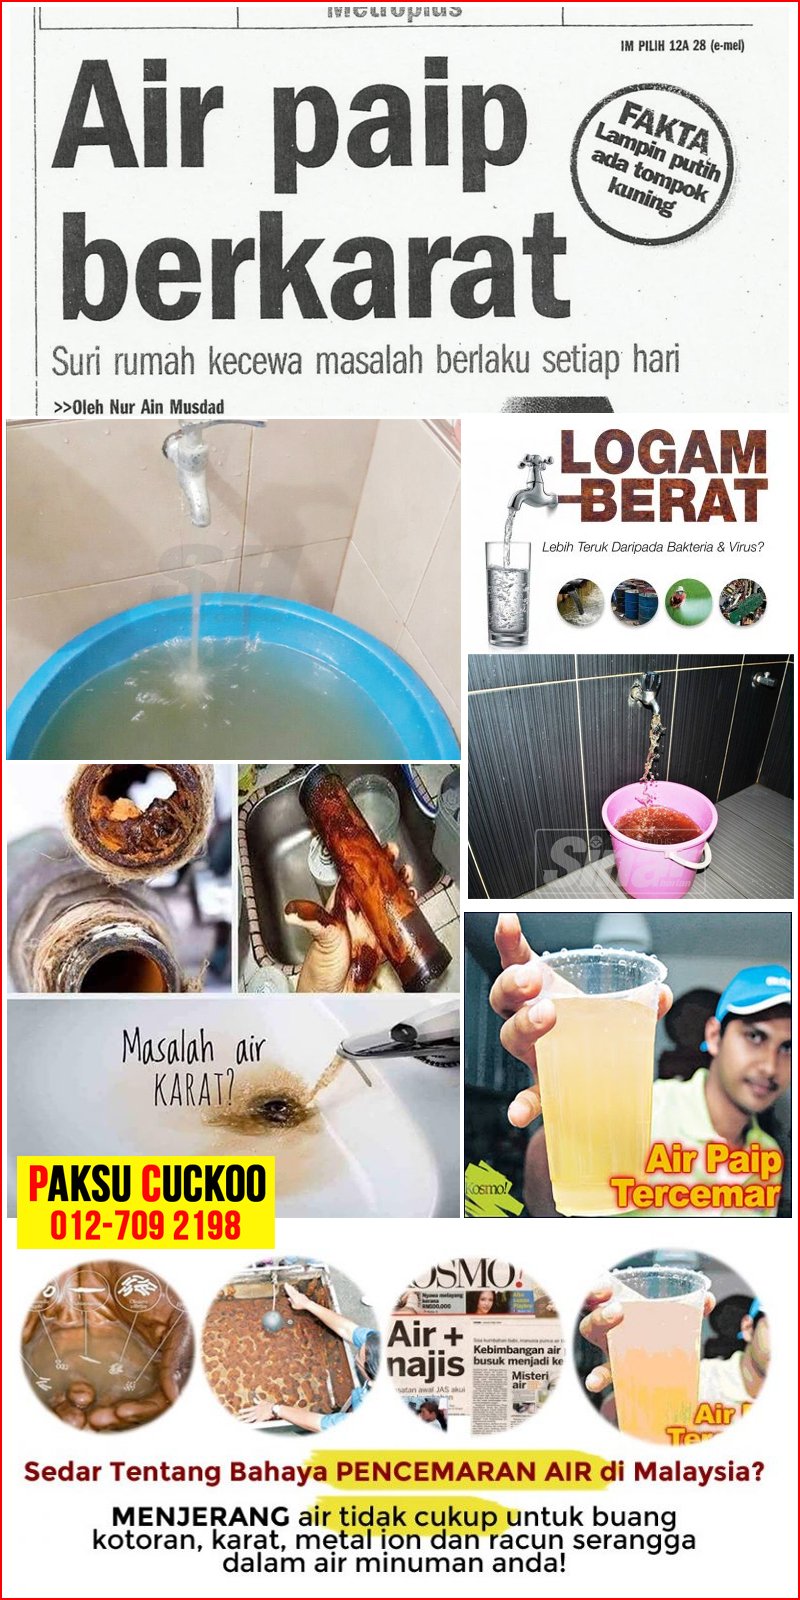 keperluan outdoor water filter perlis kangar cuckoo outdoor water purifier untuk membersihkan kekotoran air yang masuk dalam rumah kita